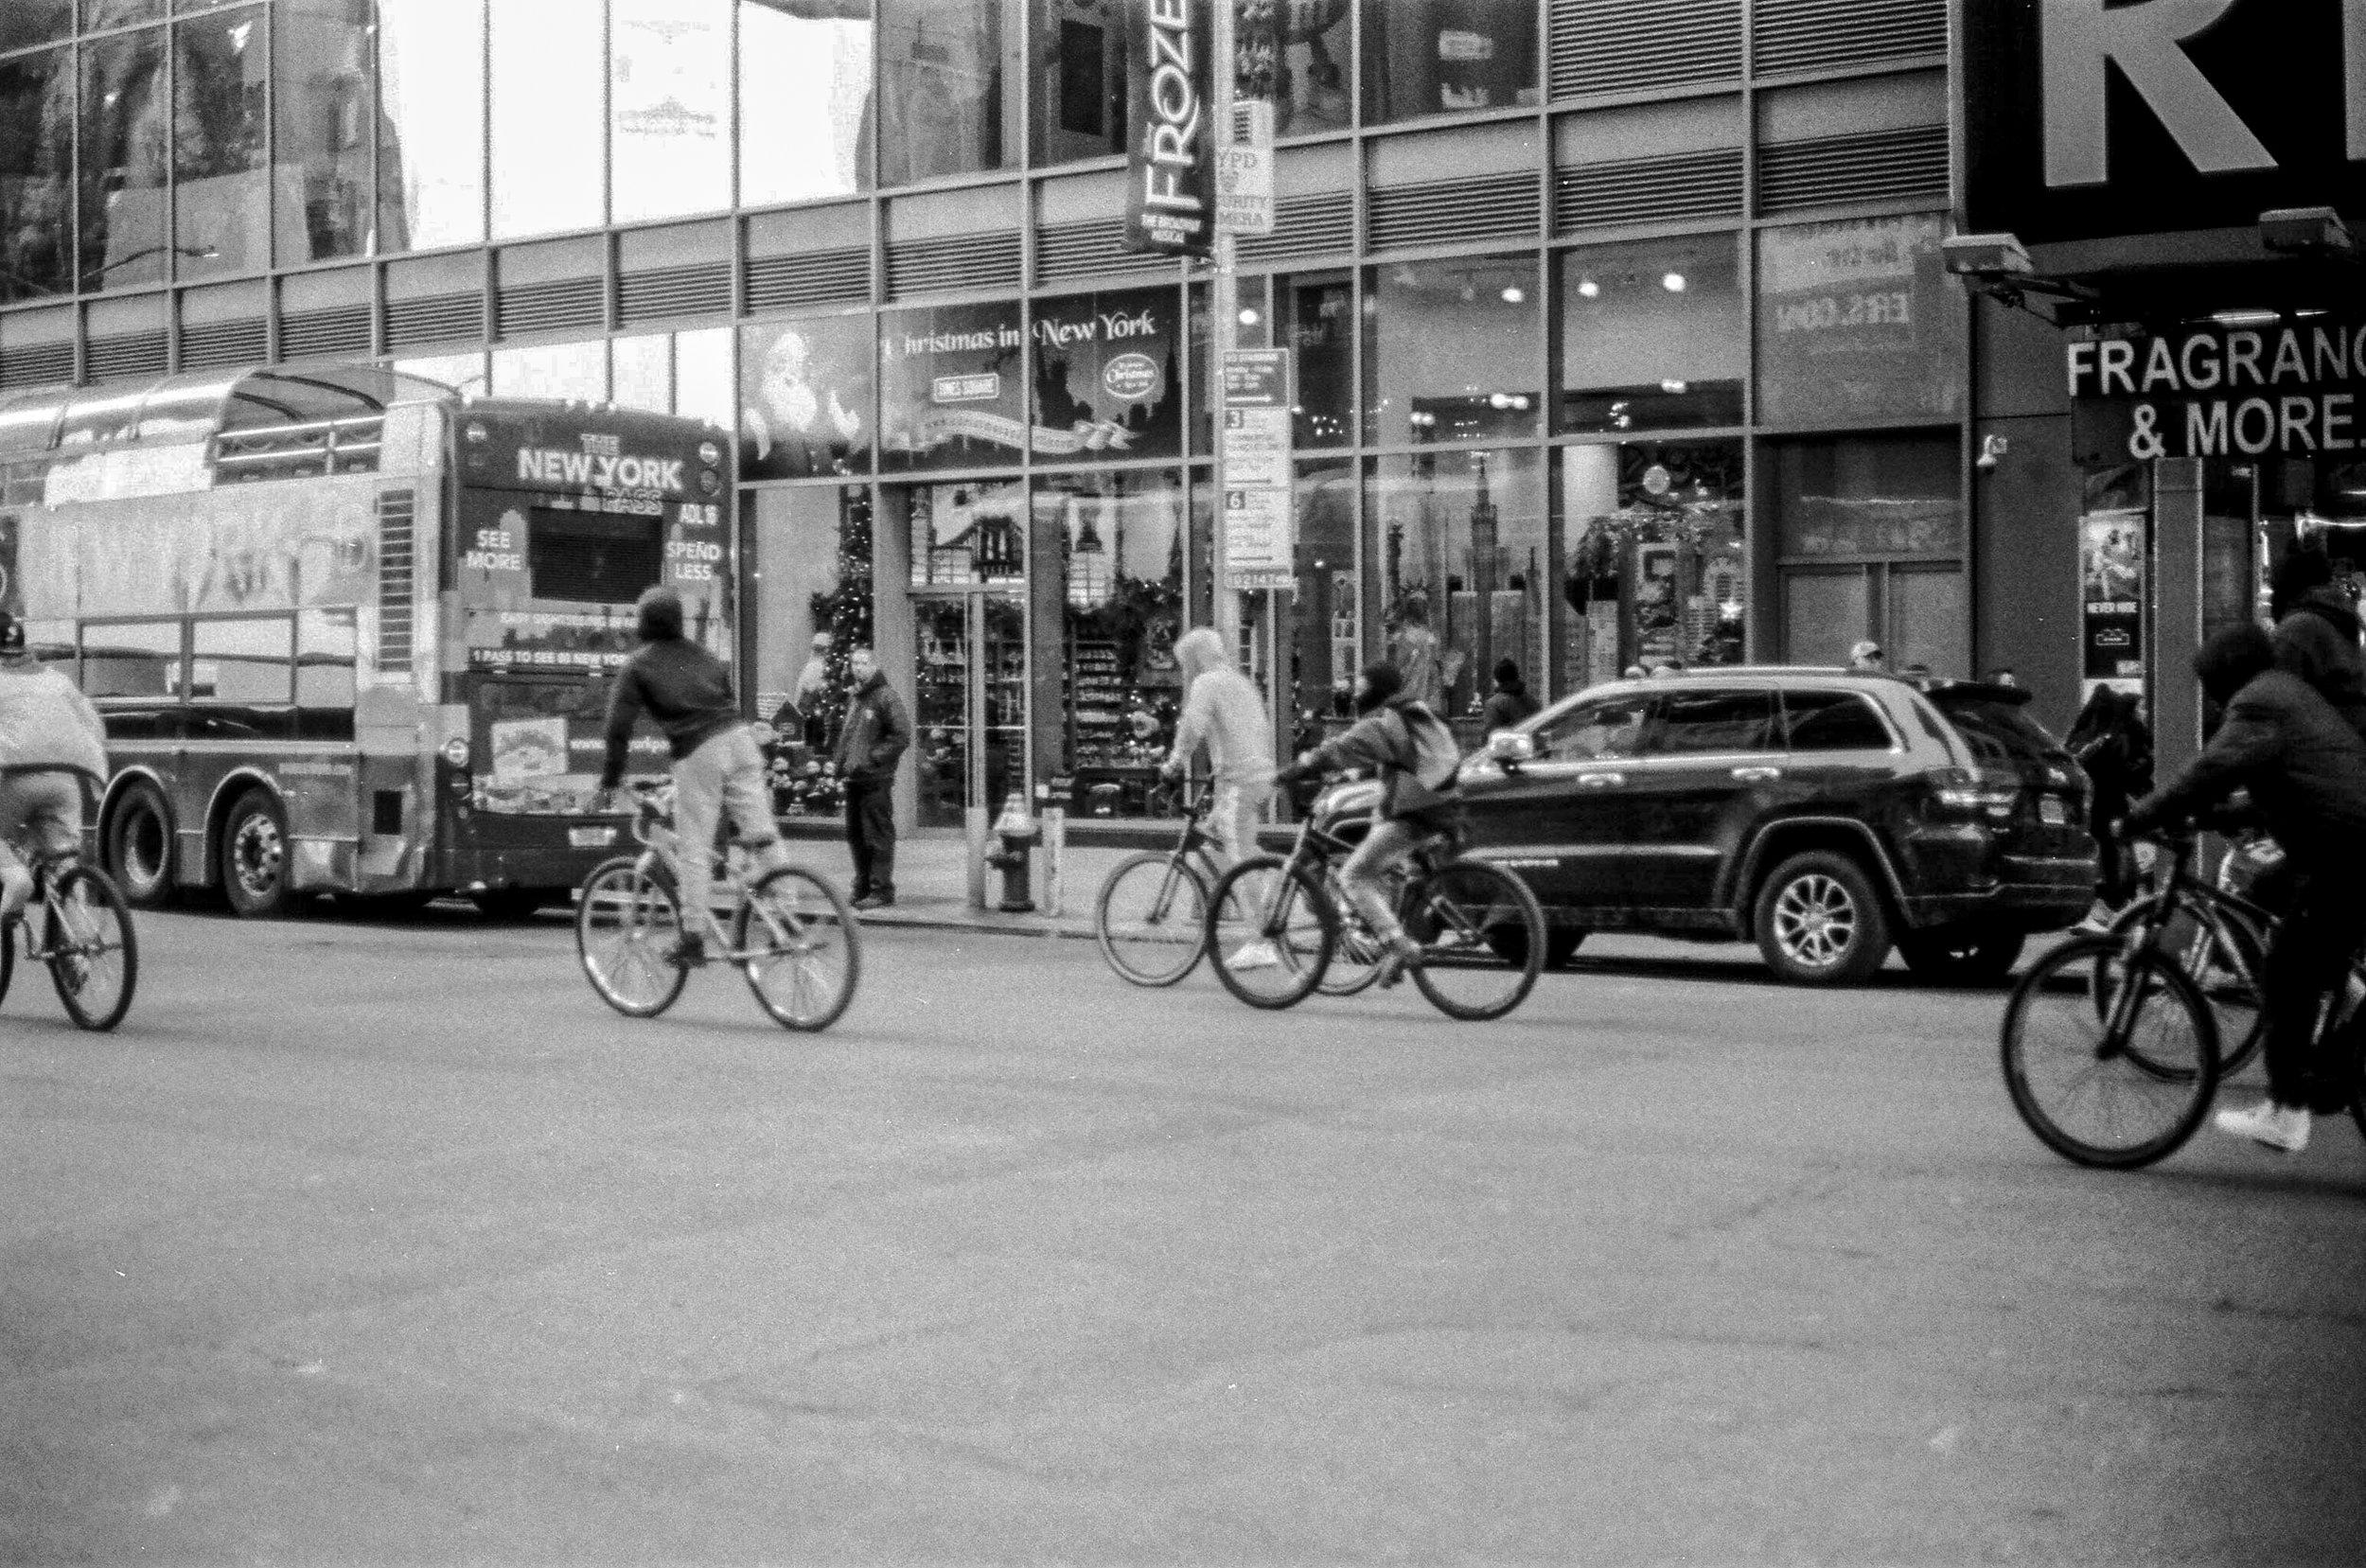 Bike Crew_Film Photography_NYC_Joe Curry Photography_2018.jpg